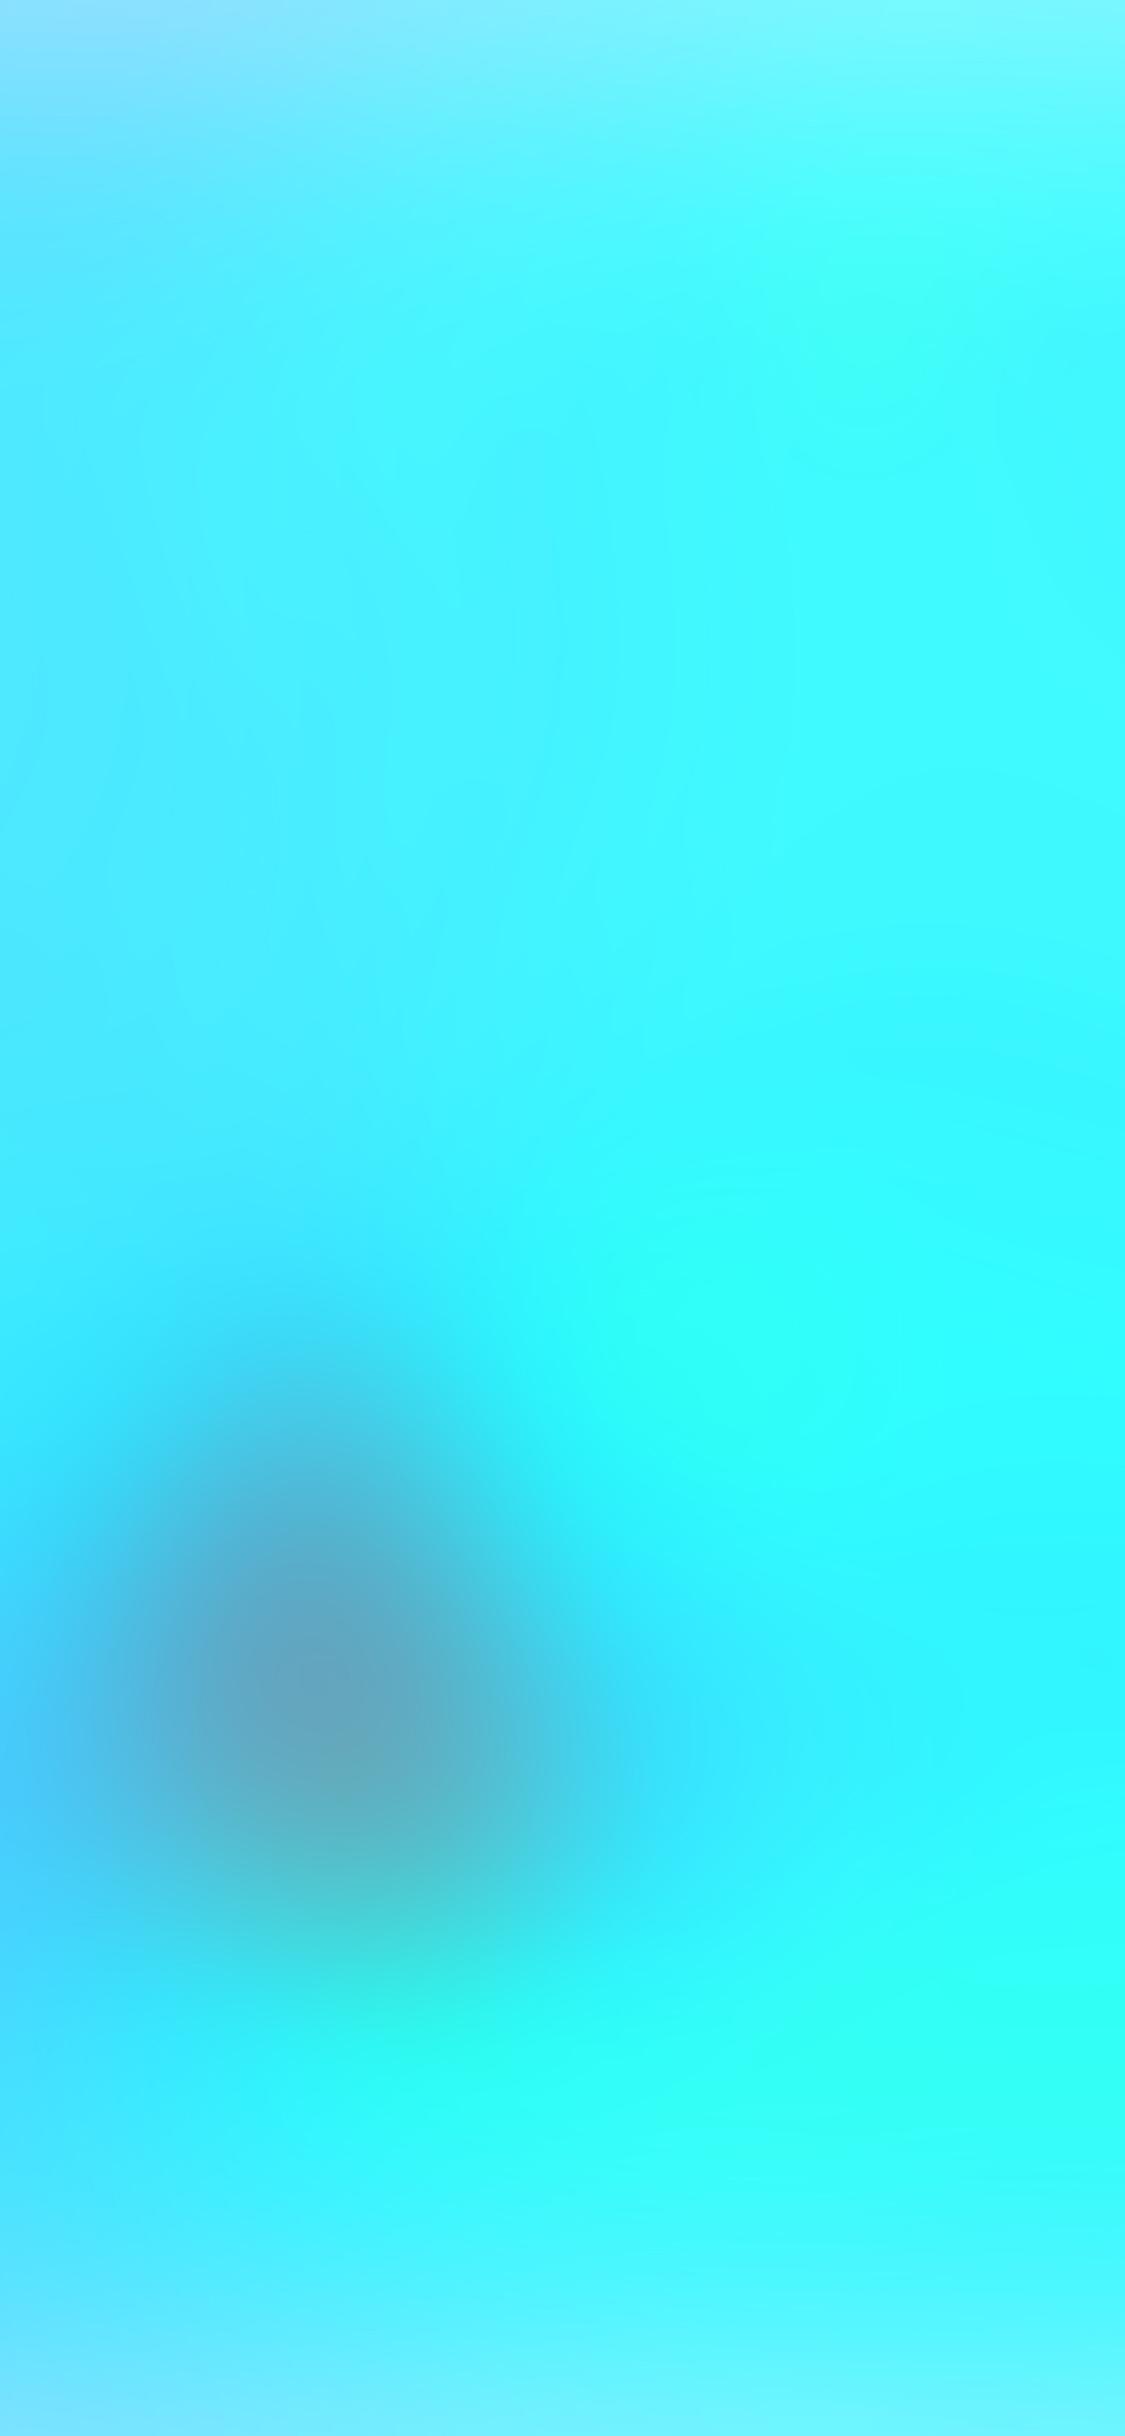 iPhoneXpapers.com-Apple-iPhone-wallpaper-sk31-clear-blue-sea-blur-gradation